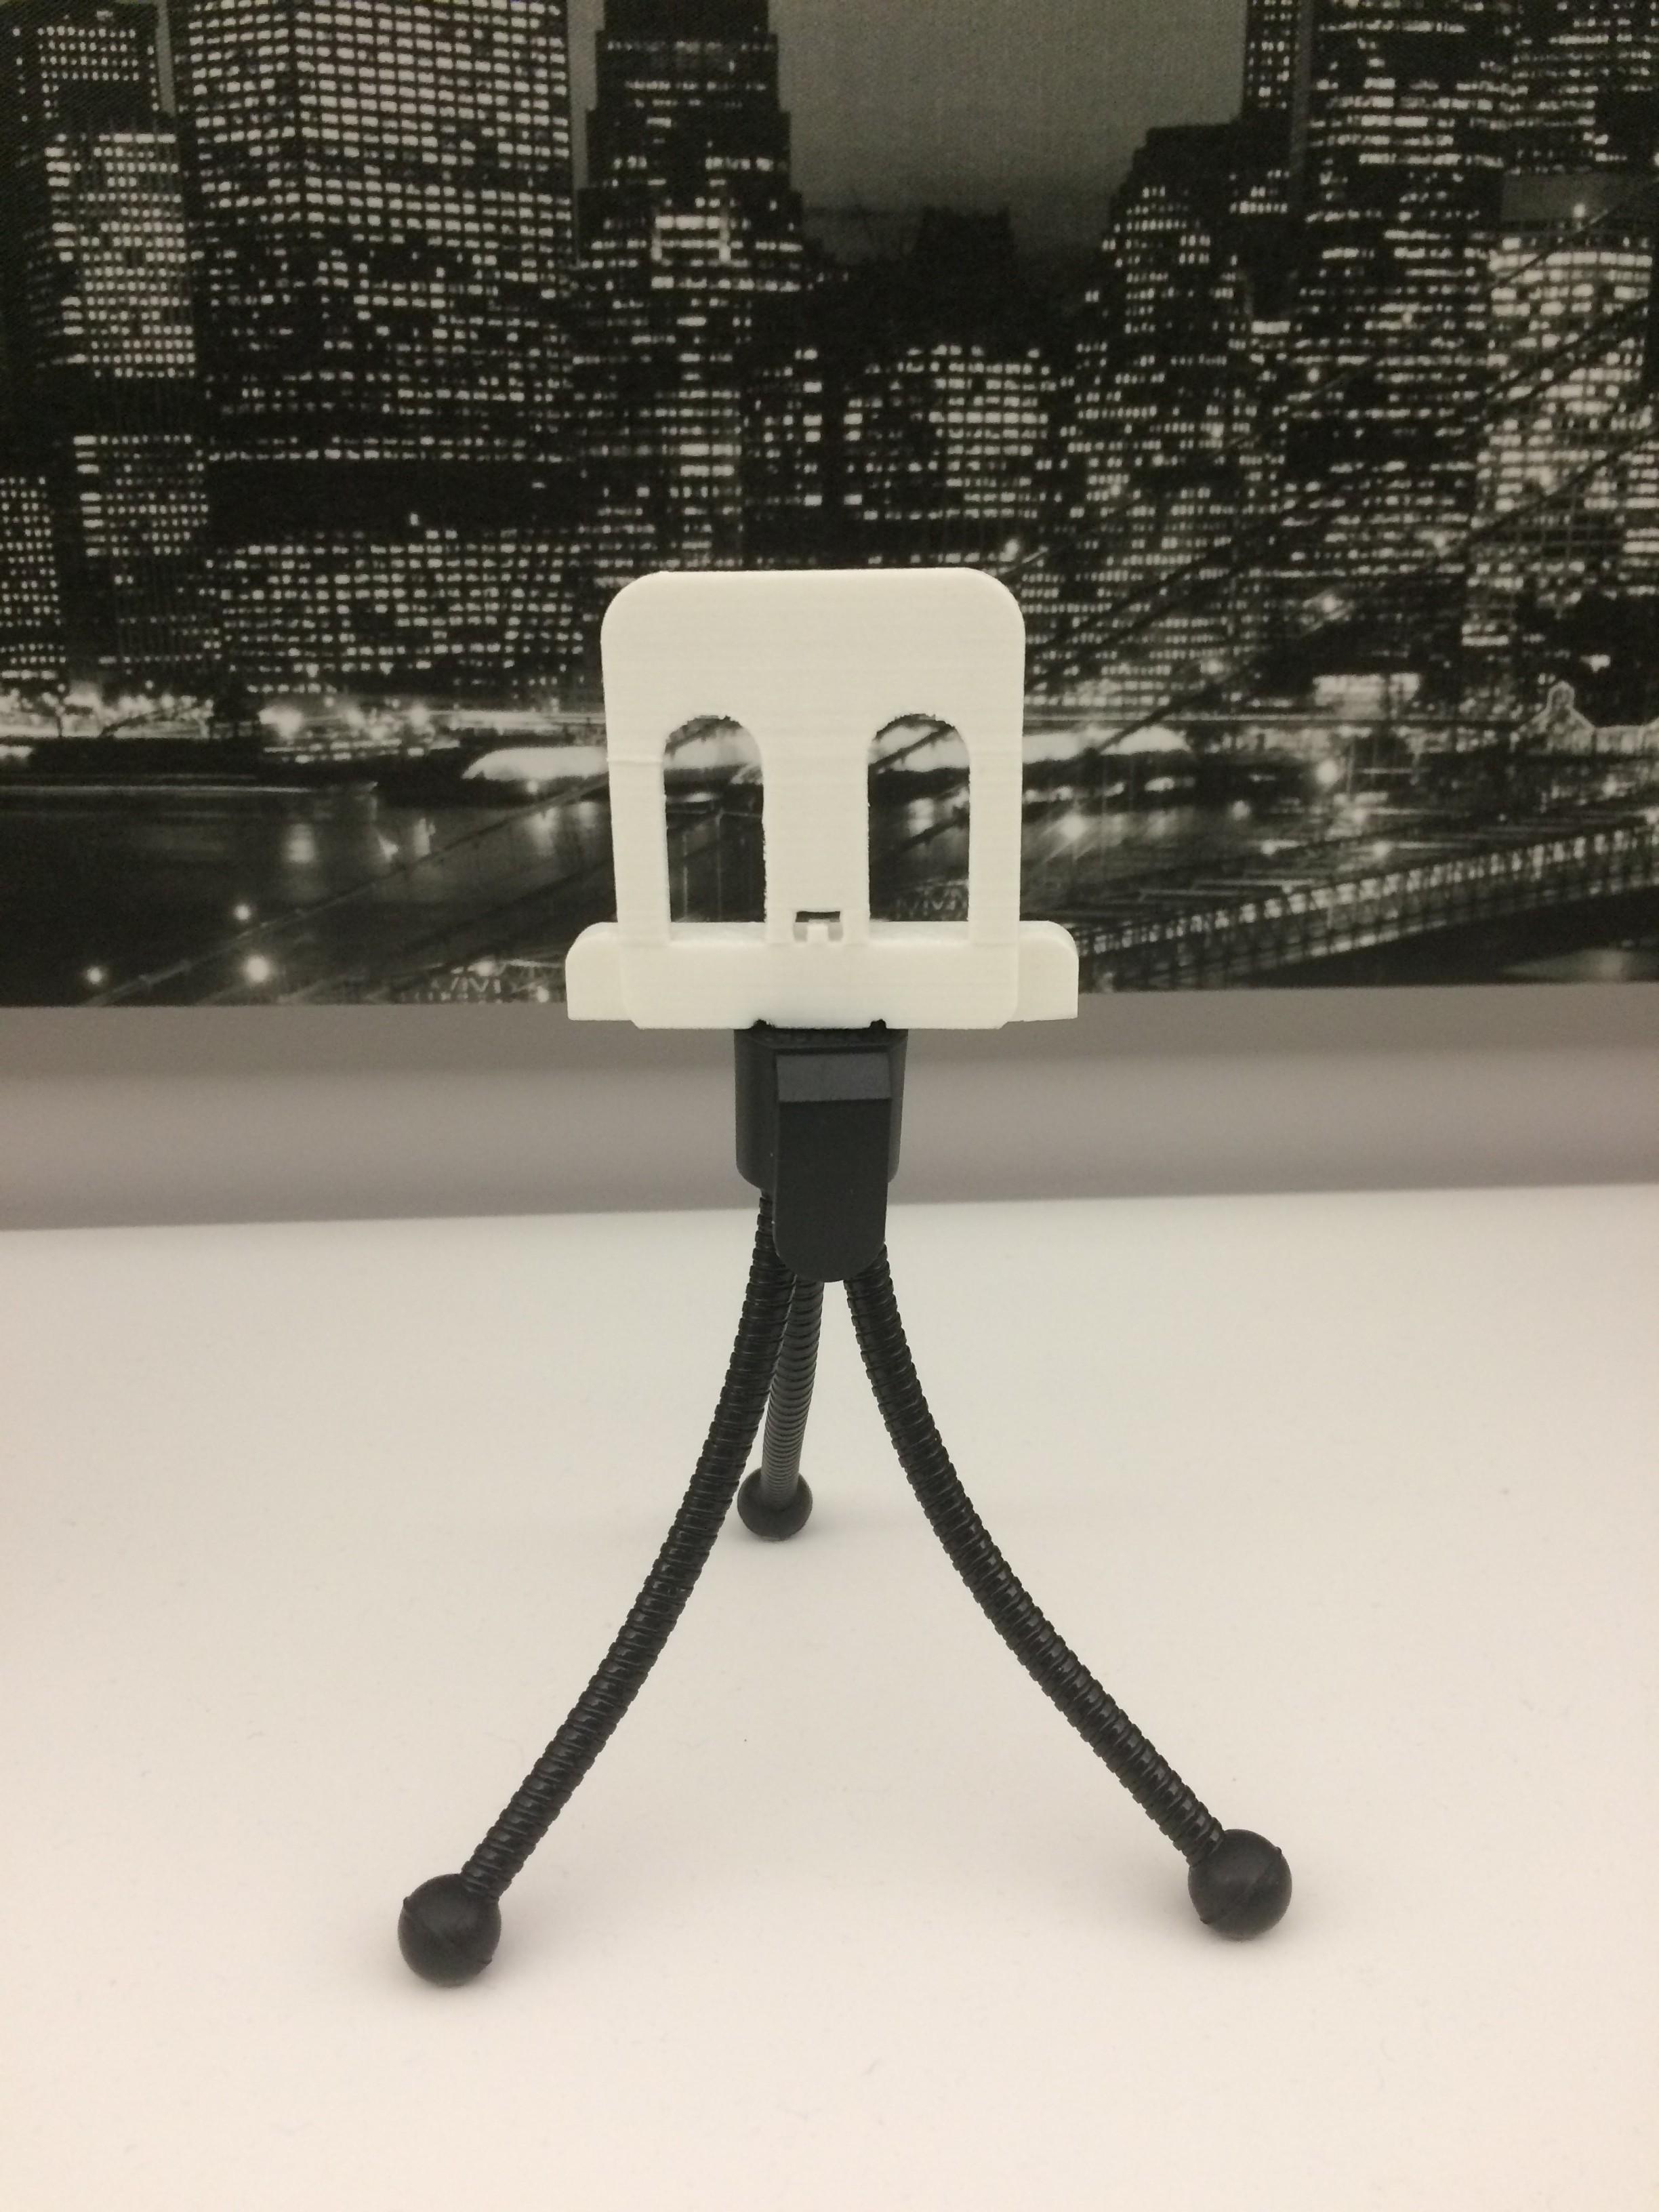 IMG_4743.JPG Download free STL file Telephone holder for tripods • 3D printer design, arth